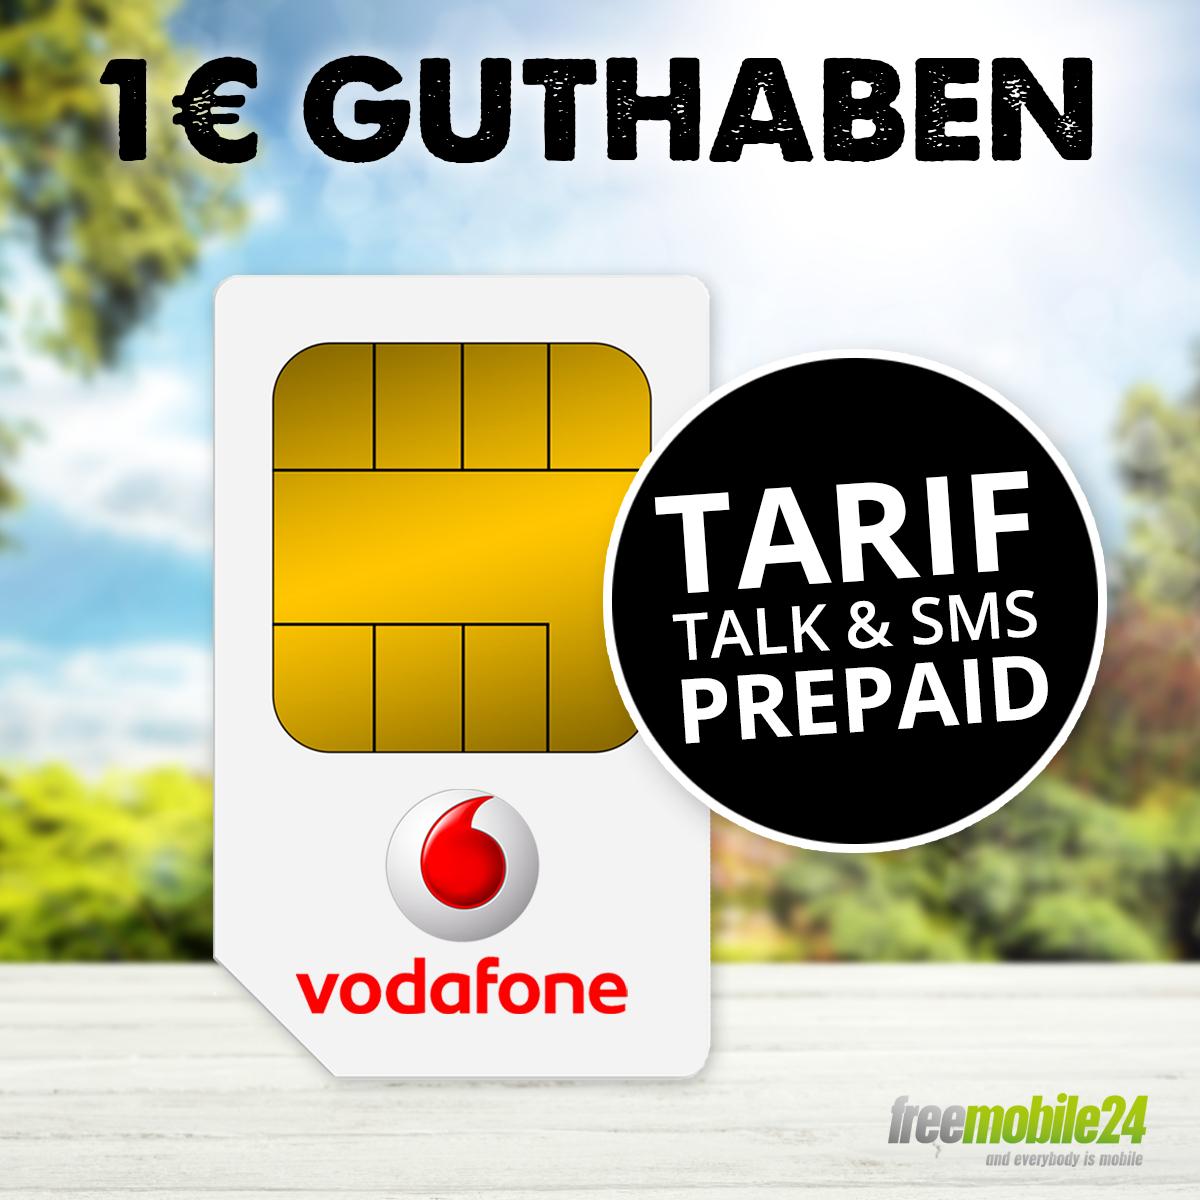 Amazon Prepaid Karten Vodafon